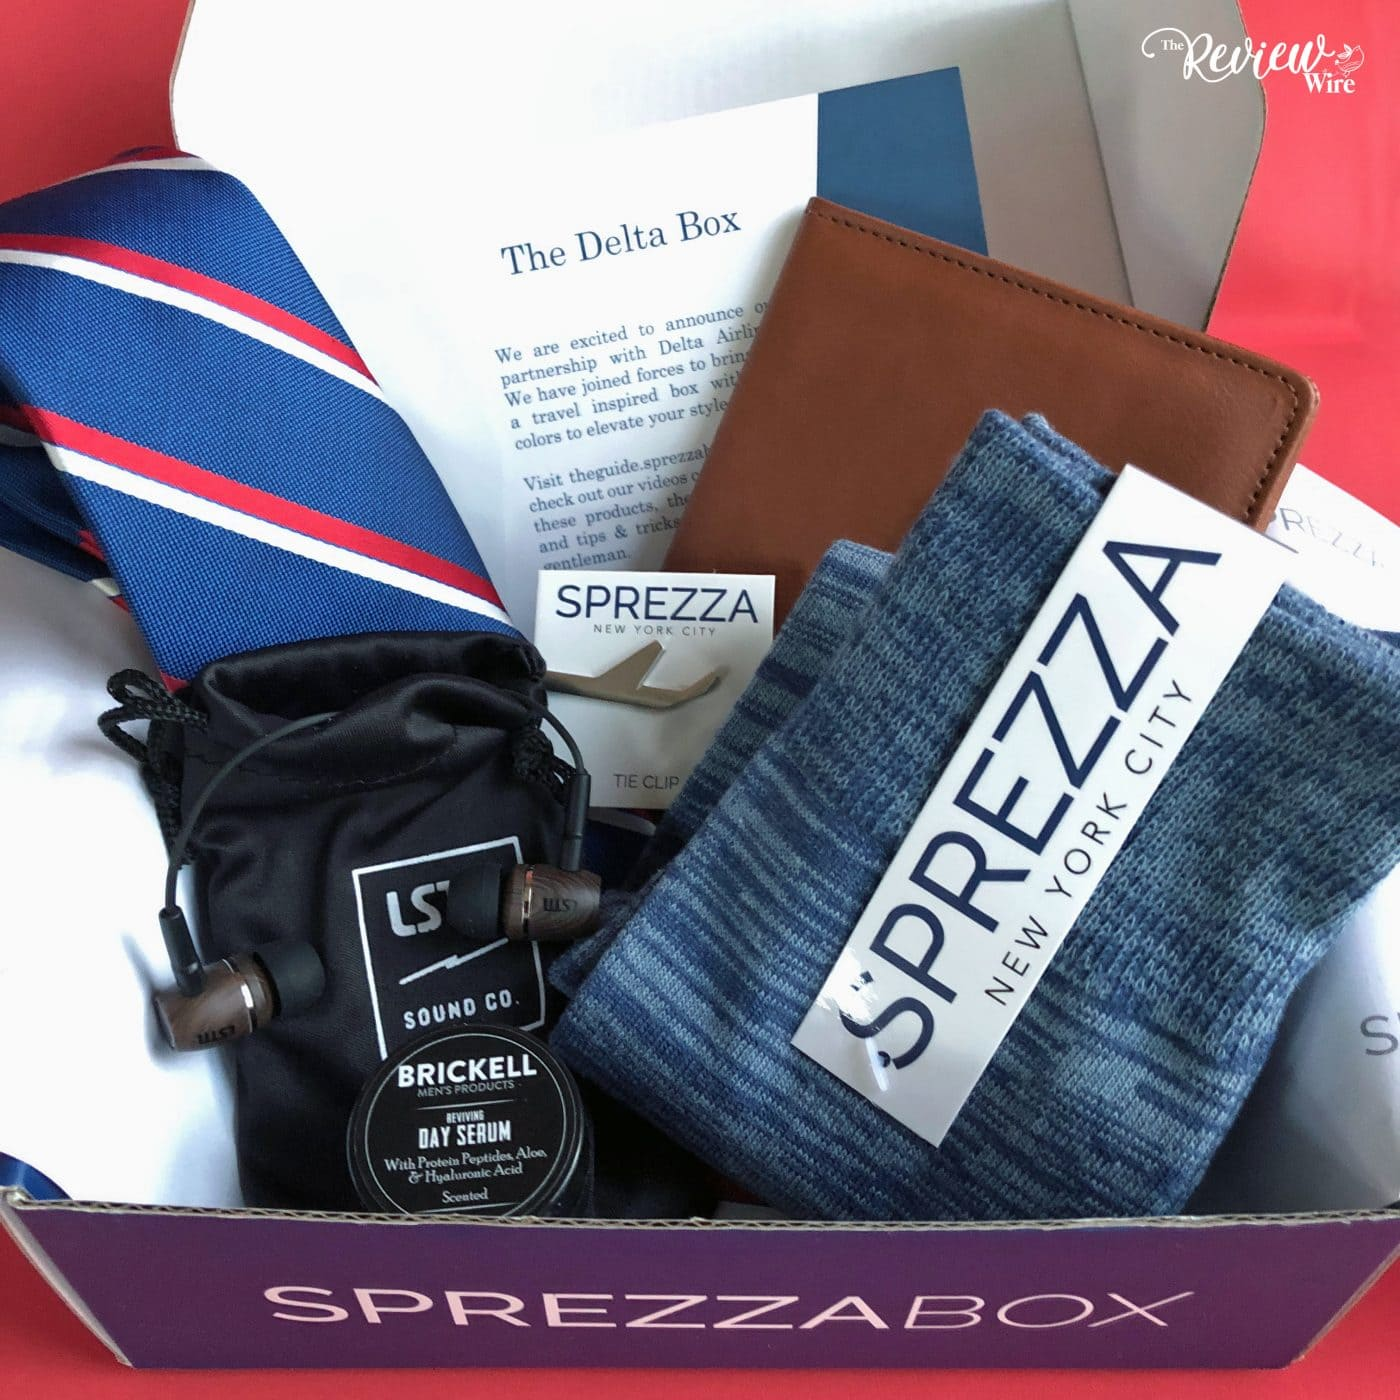 Delta SprezzaBox